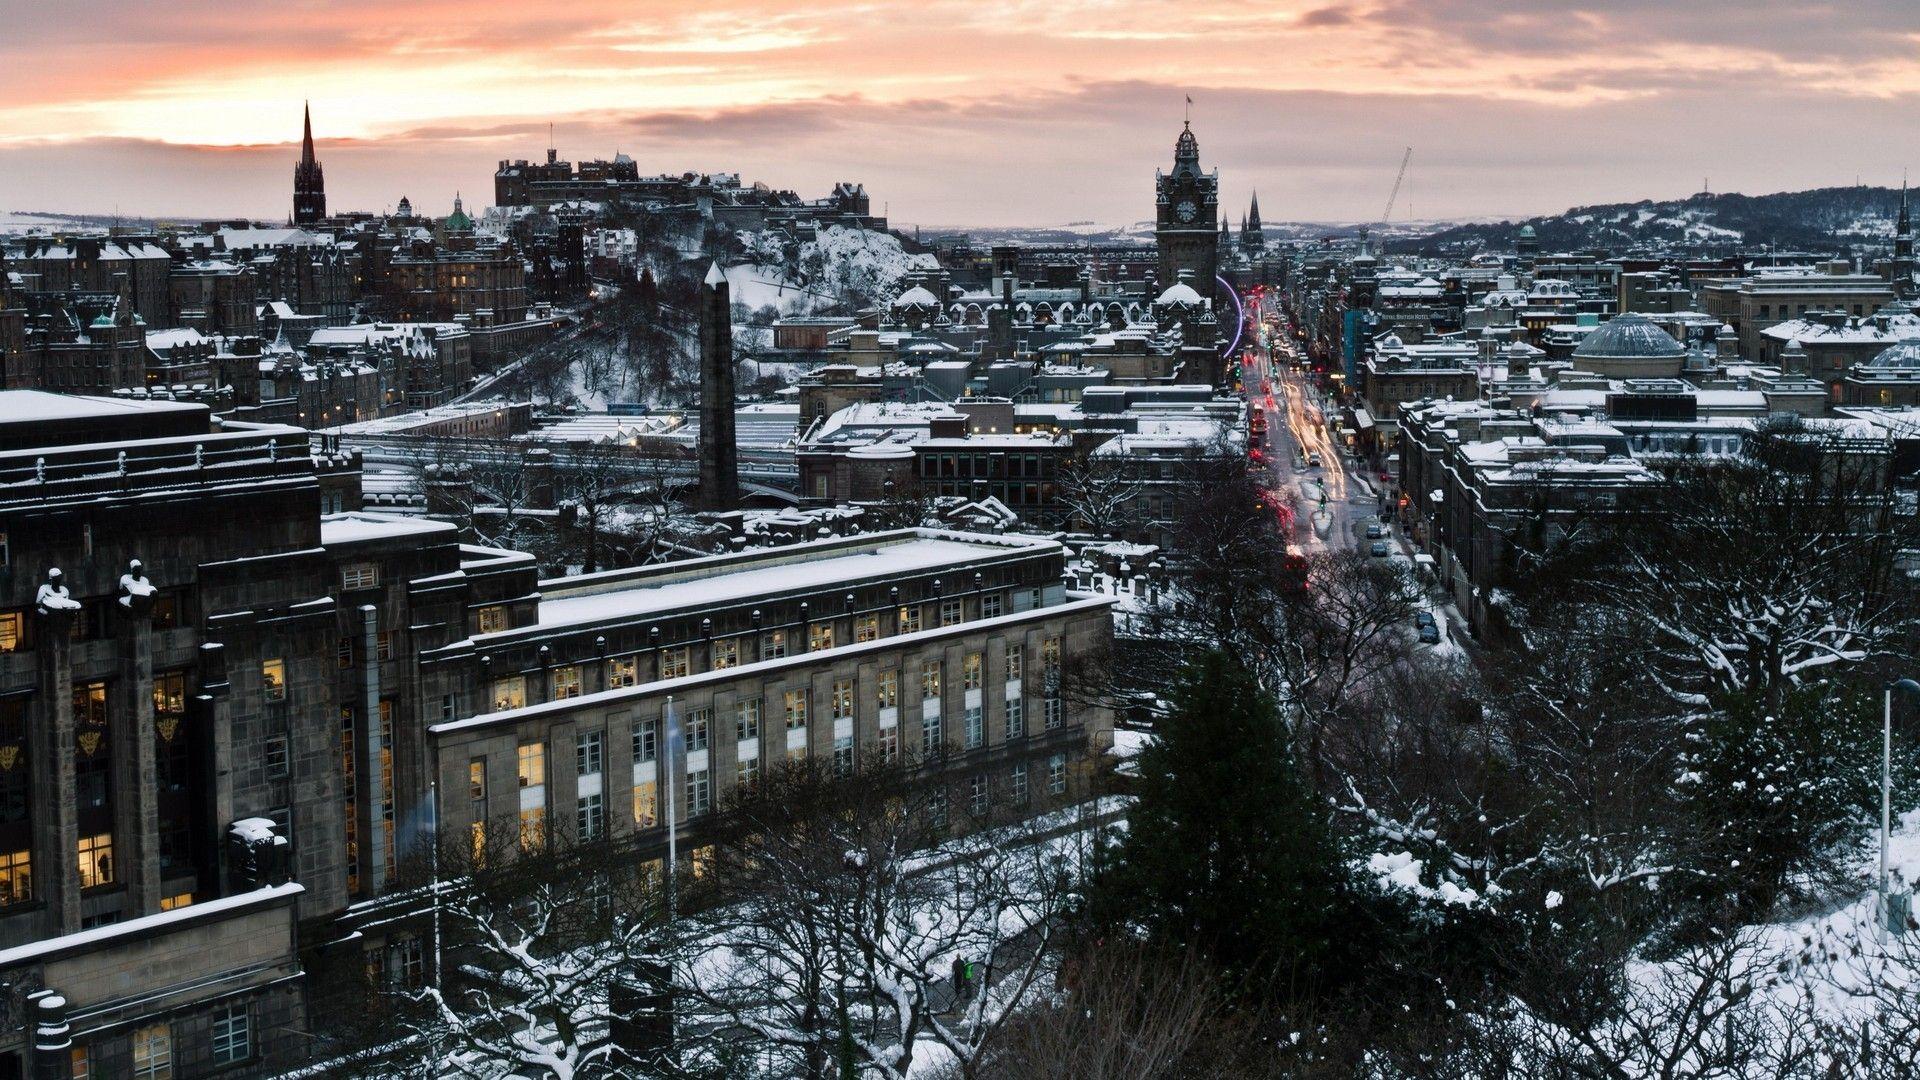 Falling Snow Wallpaper Widescreen 1920x1080 Wallpaper Edinburgh Scotland Winter Snow